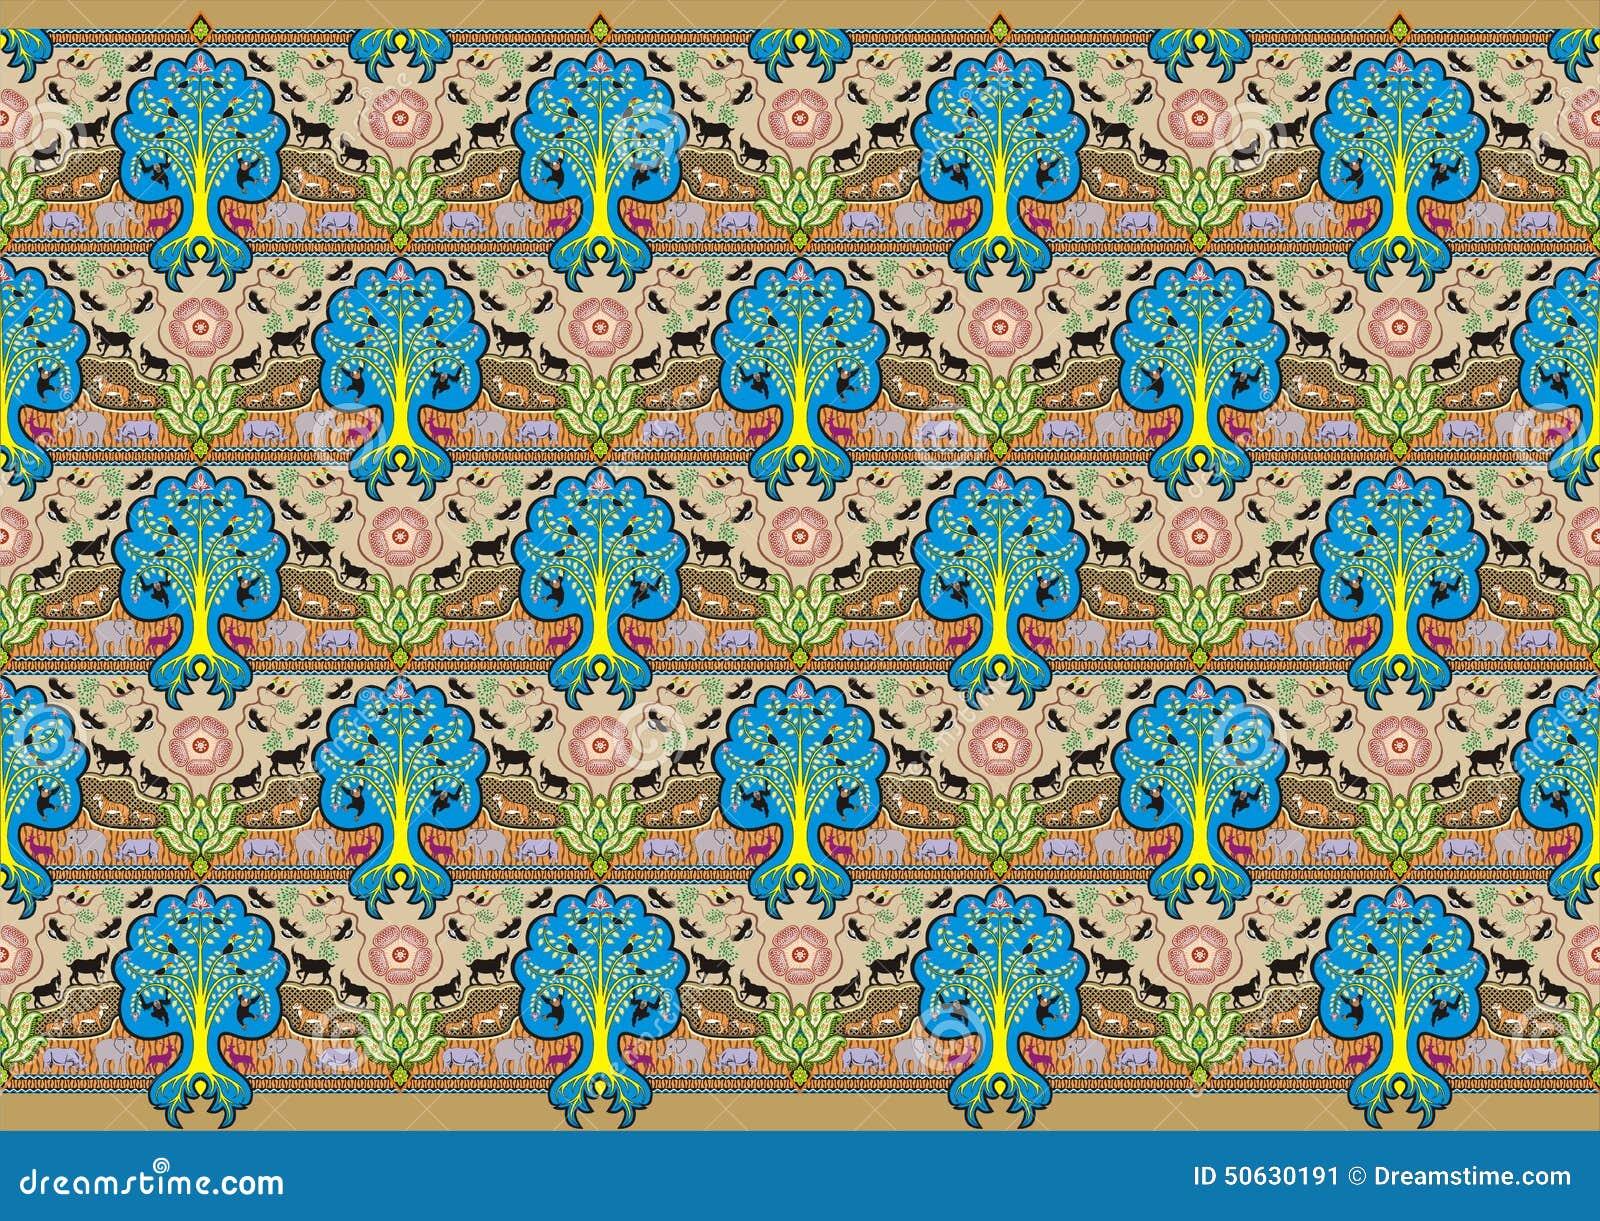 Batik design royalty free stock photos image 29546988 - Tree Batik Decoration Motif Stock Image